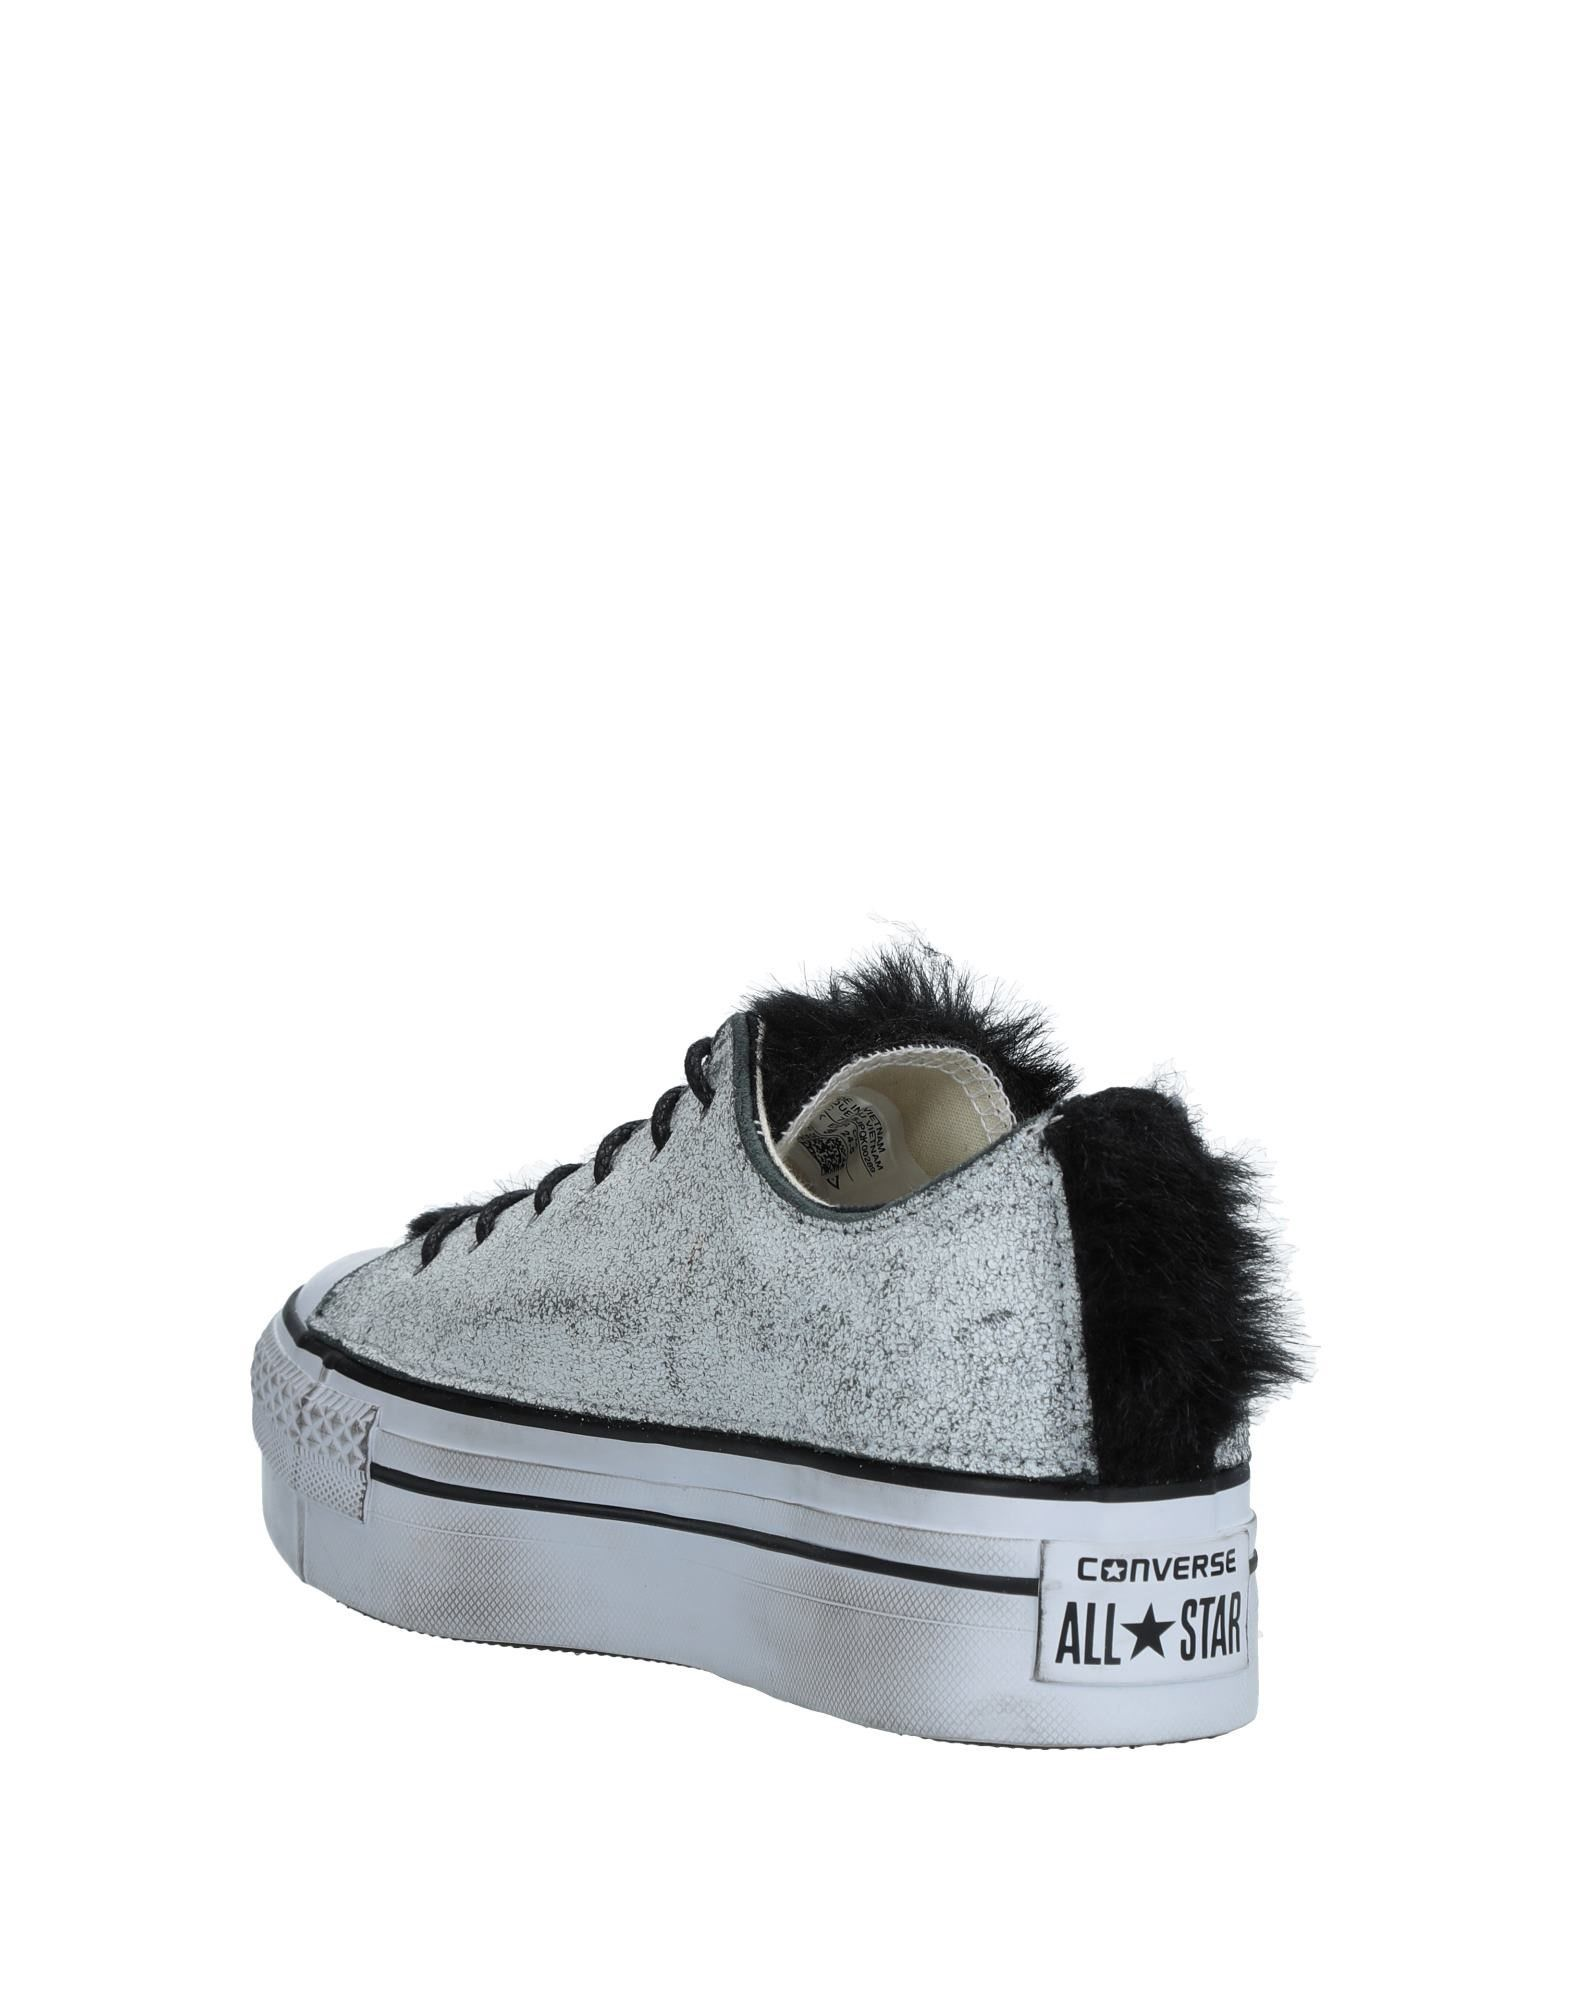 Gut Edition um billige Schuhe zu tragenConverse Limited Edition Gut Sneakers Damen  11540947AV f4964c